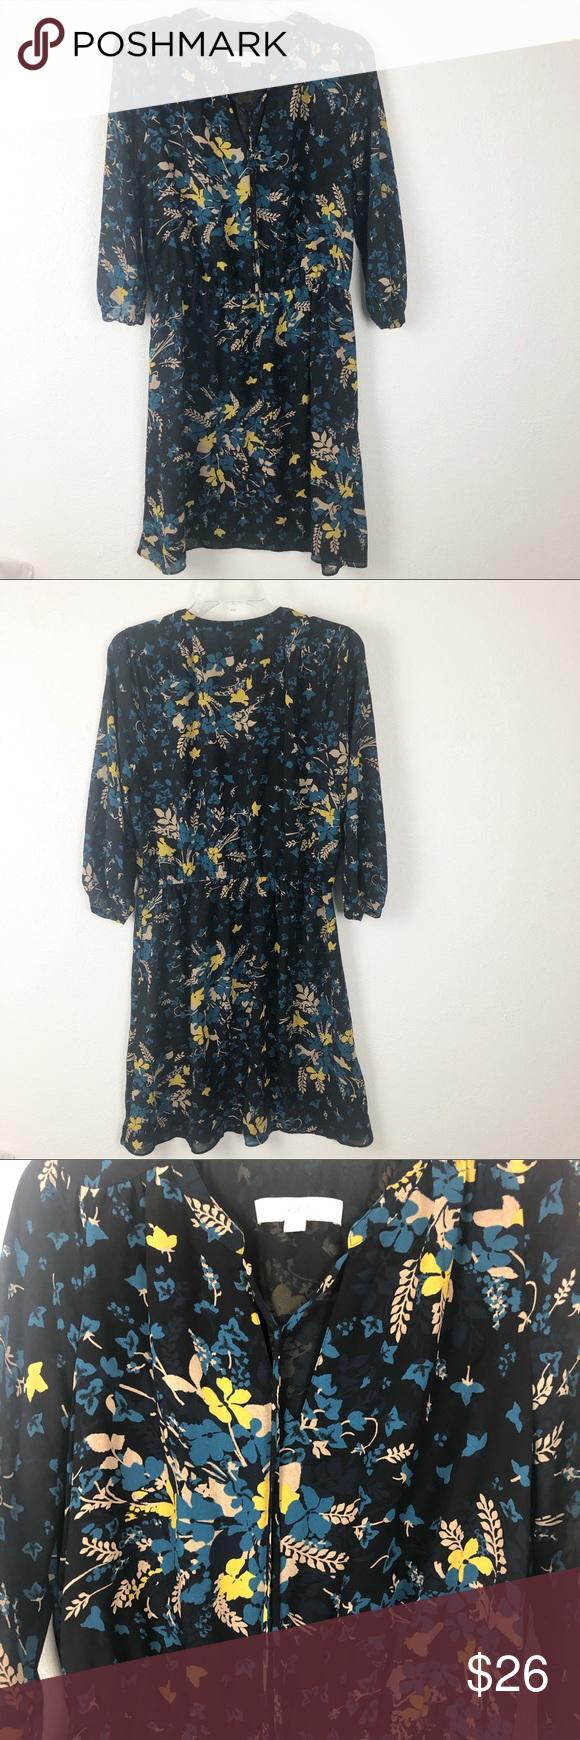 Loft Floral Black Dress 3 4 Sleeve V Neck M Loft Black Dress With Blue Yellow Flowers And Tan Leaves 3 4 Length S Floral Dress Black Black Floral Black Dress [ 1740 x 580 Pixel ]